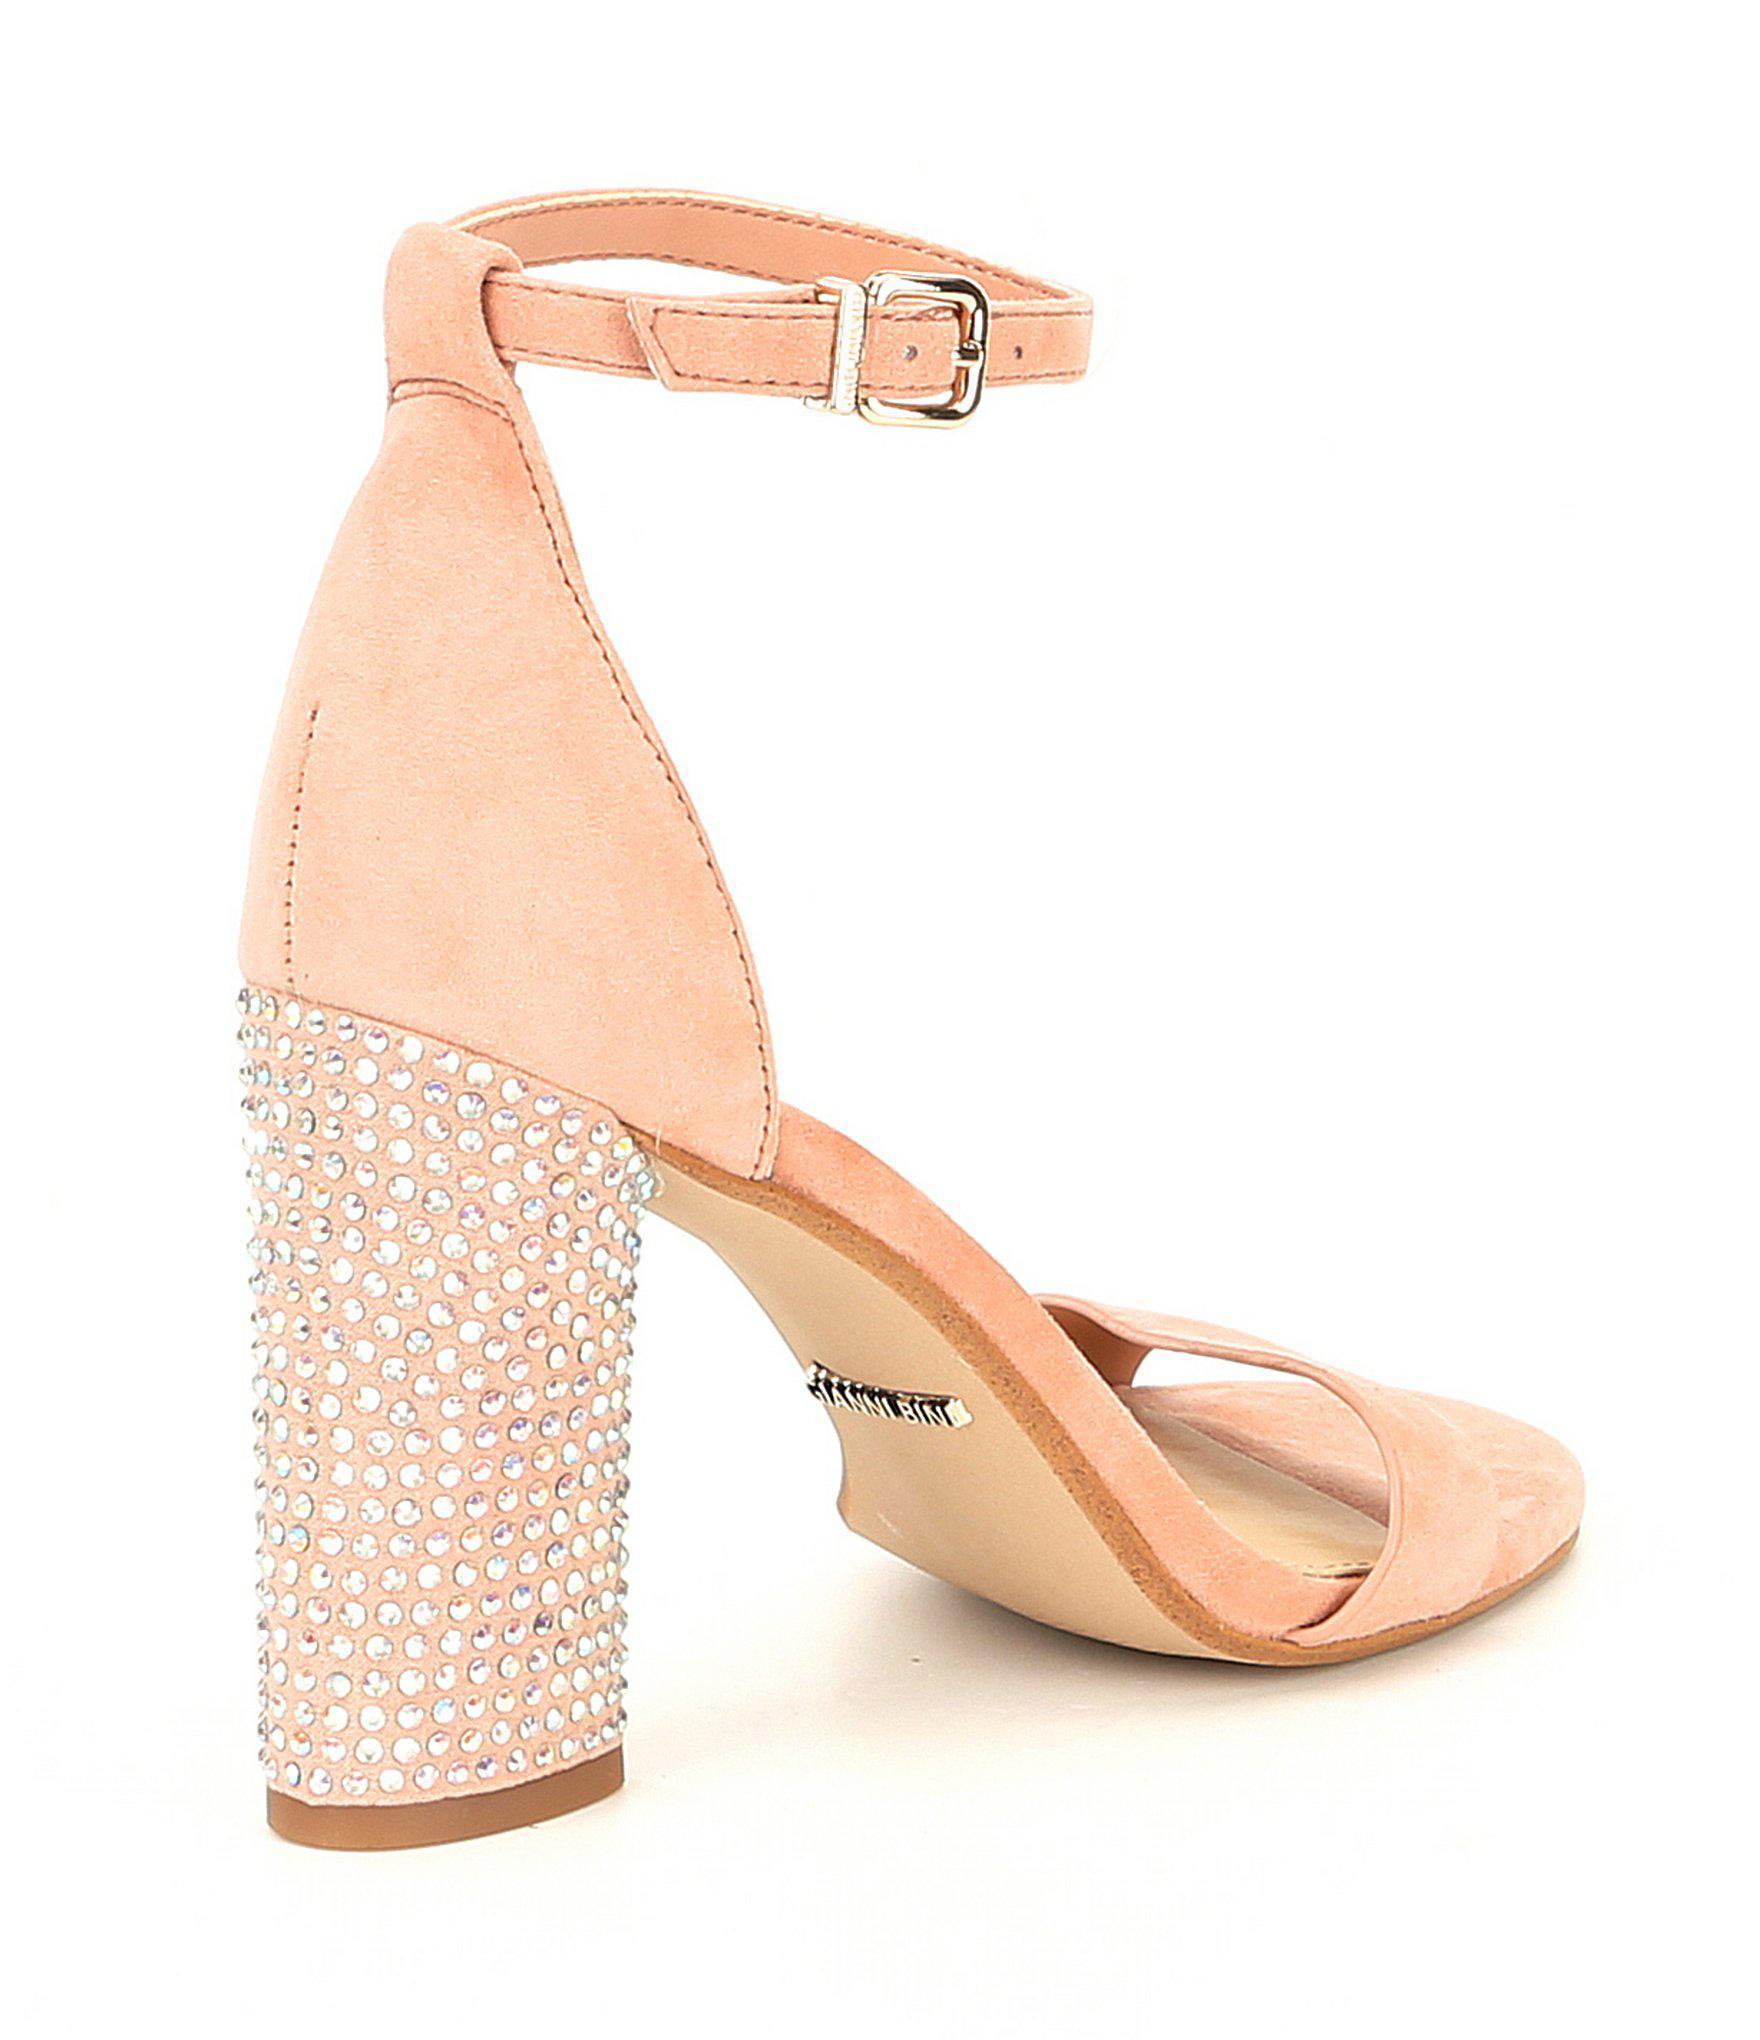 6f64810f742 Gianni Bini Carlosa Suede Ankle Strap And Jeweled Block Heel Sandals ...